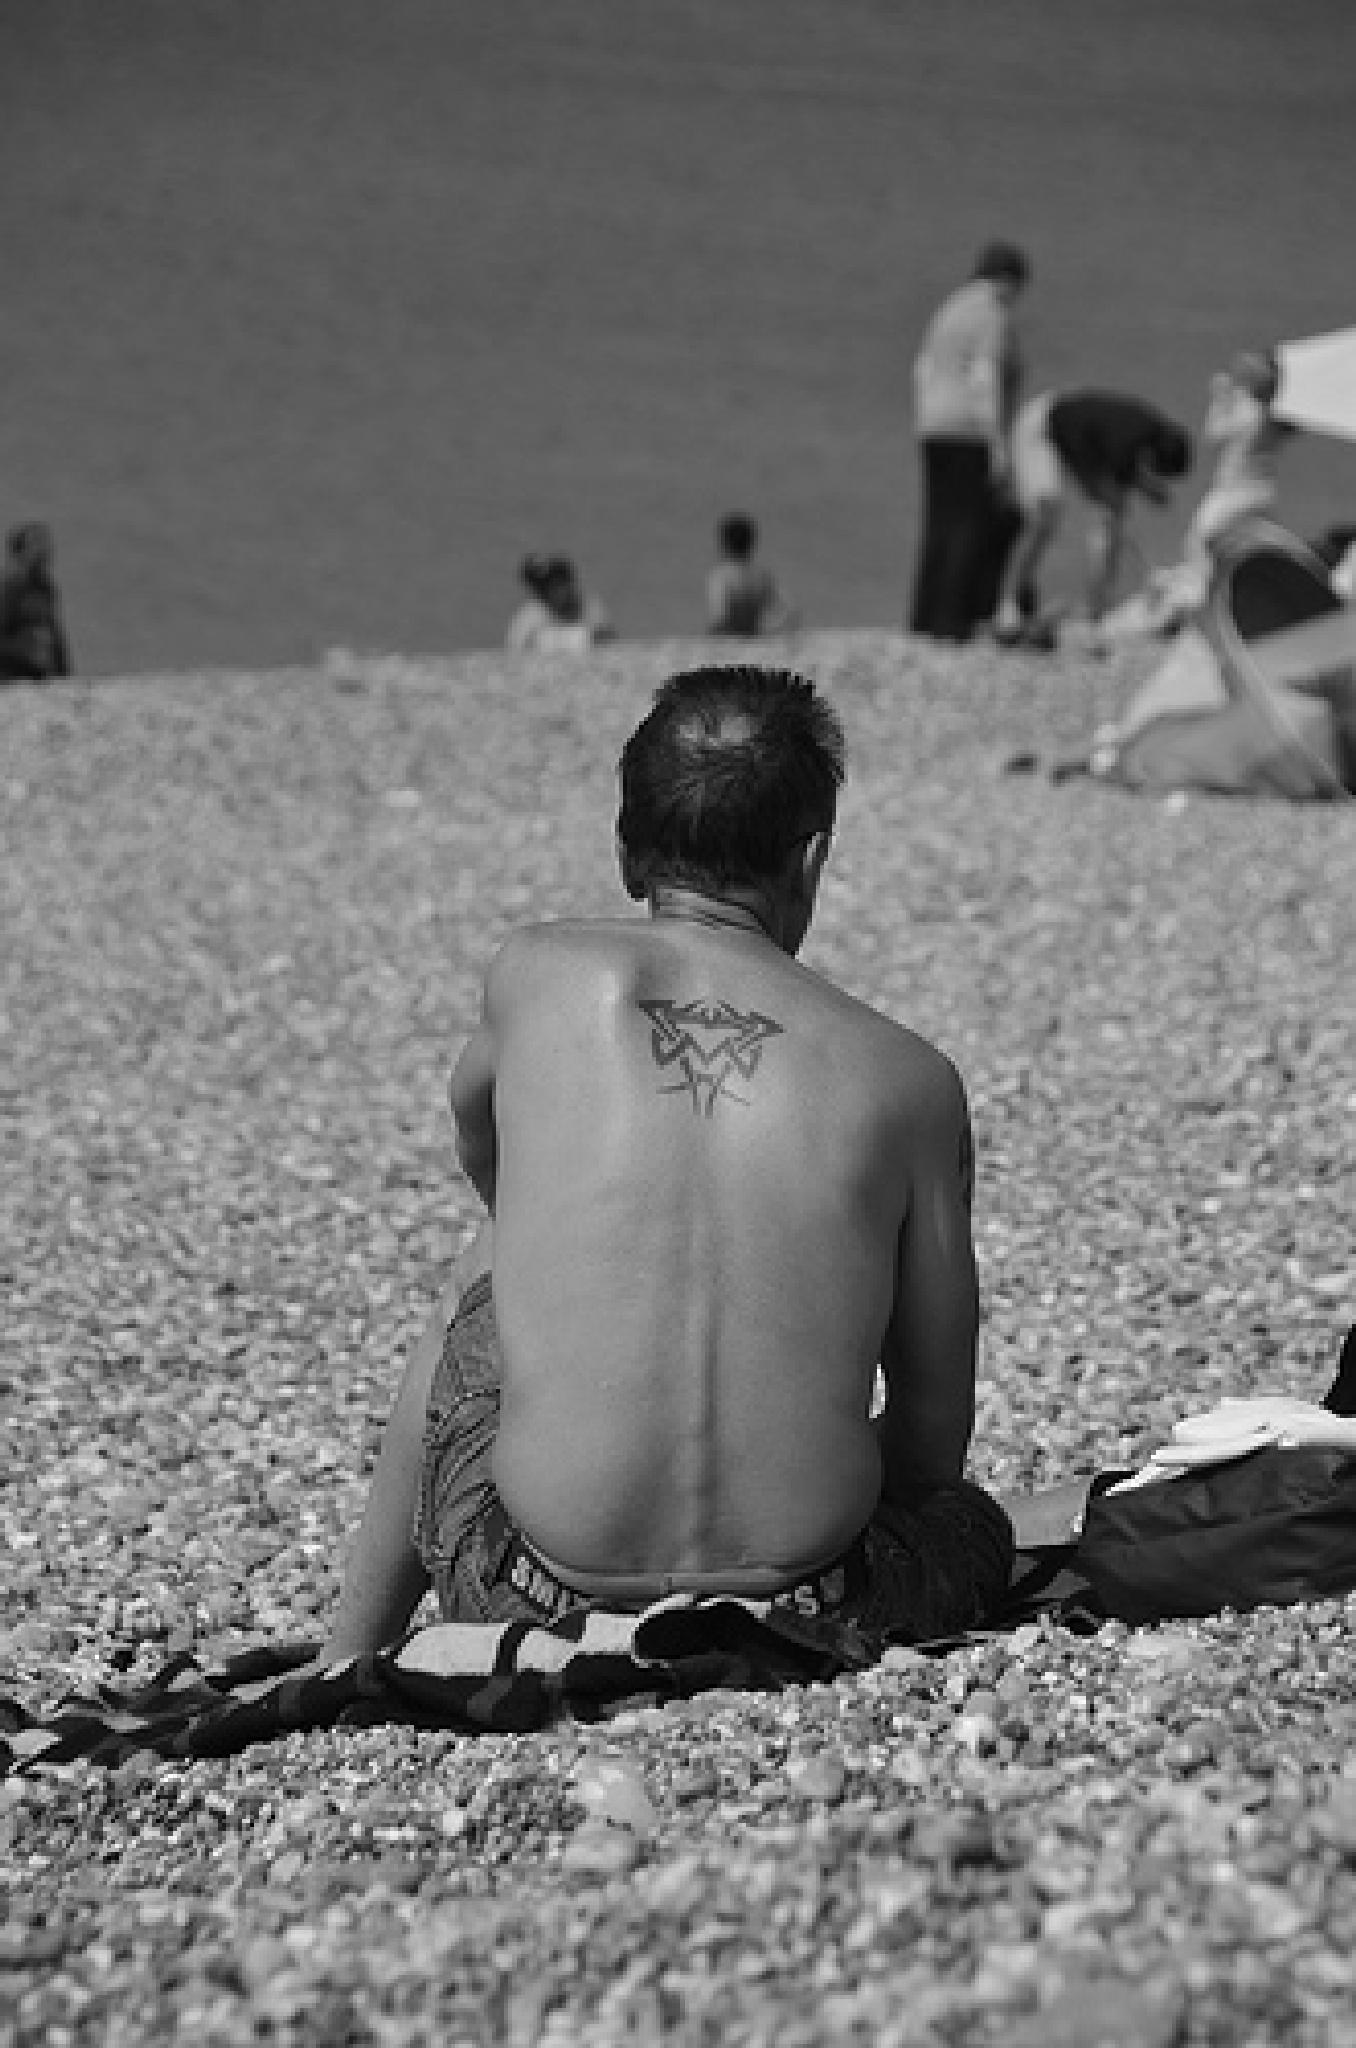 Brighton Beach by melaniehartshorn40